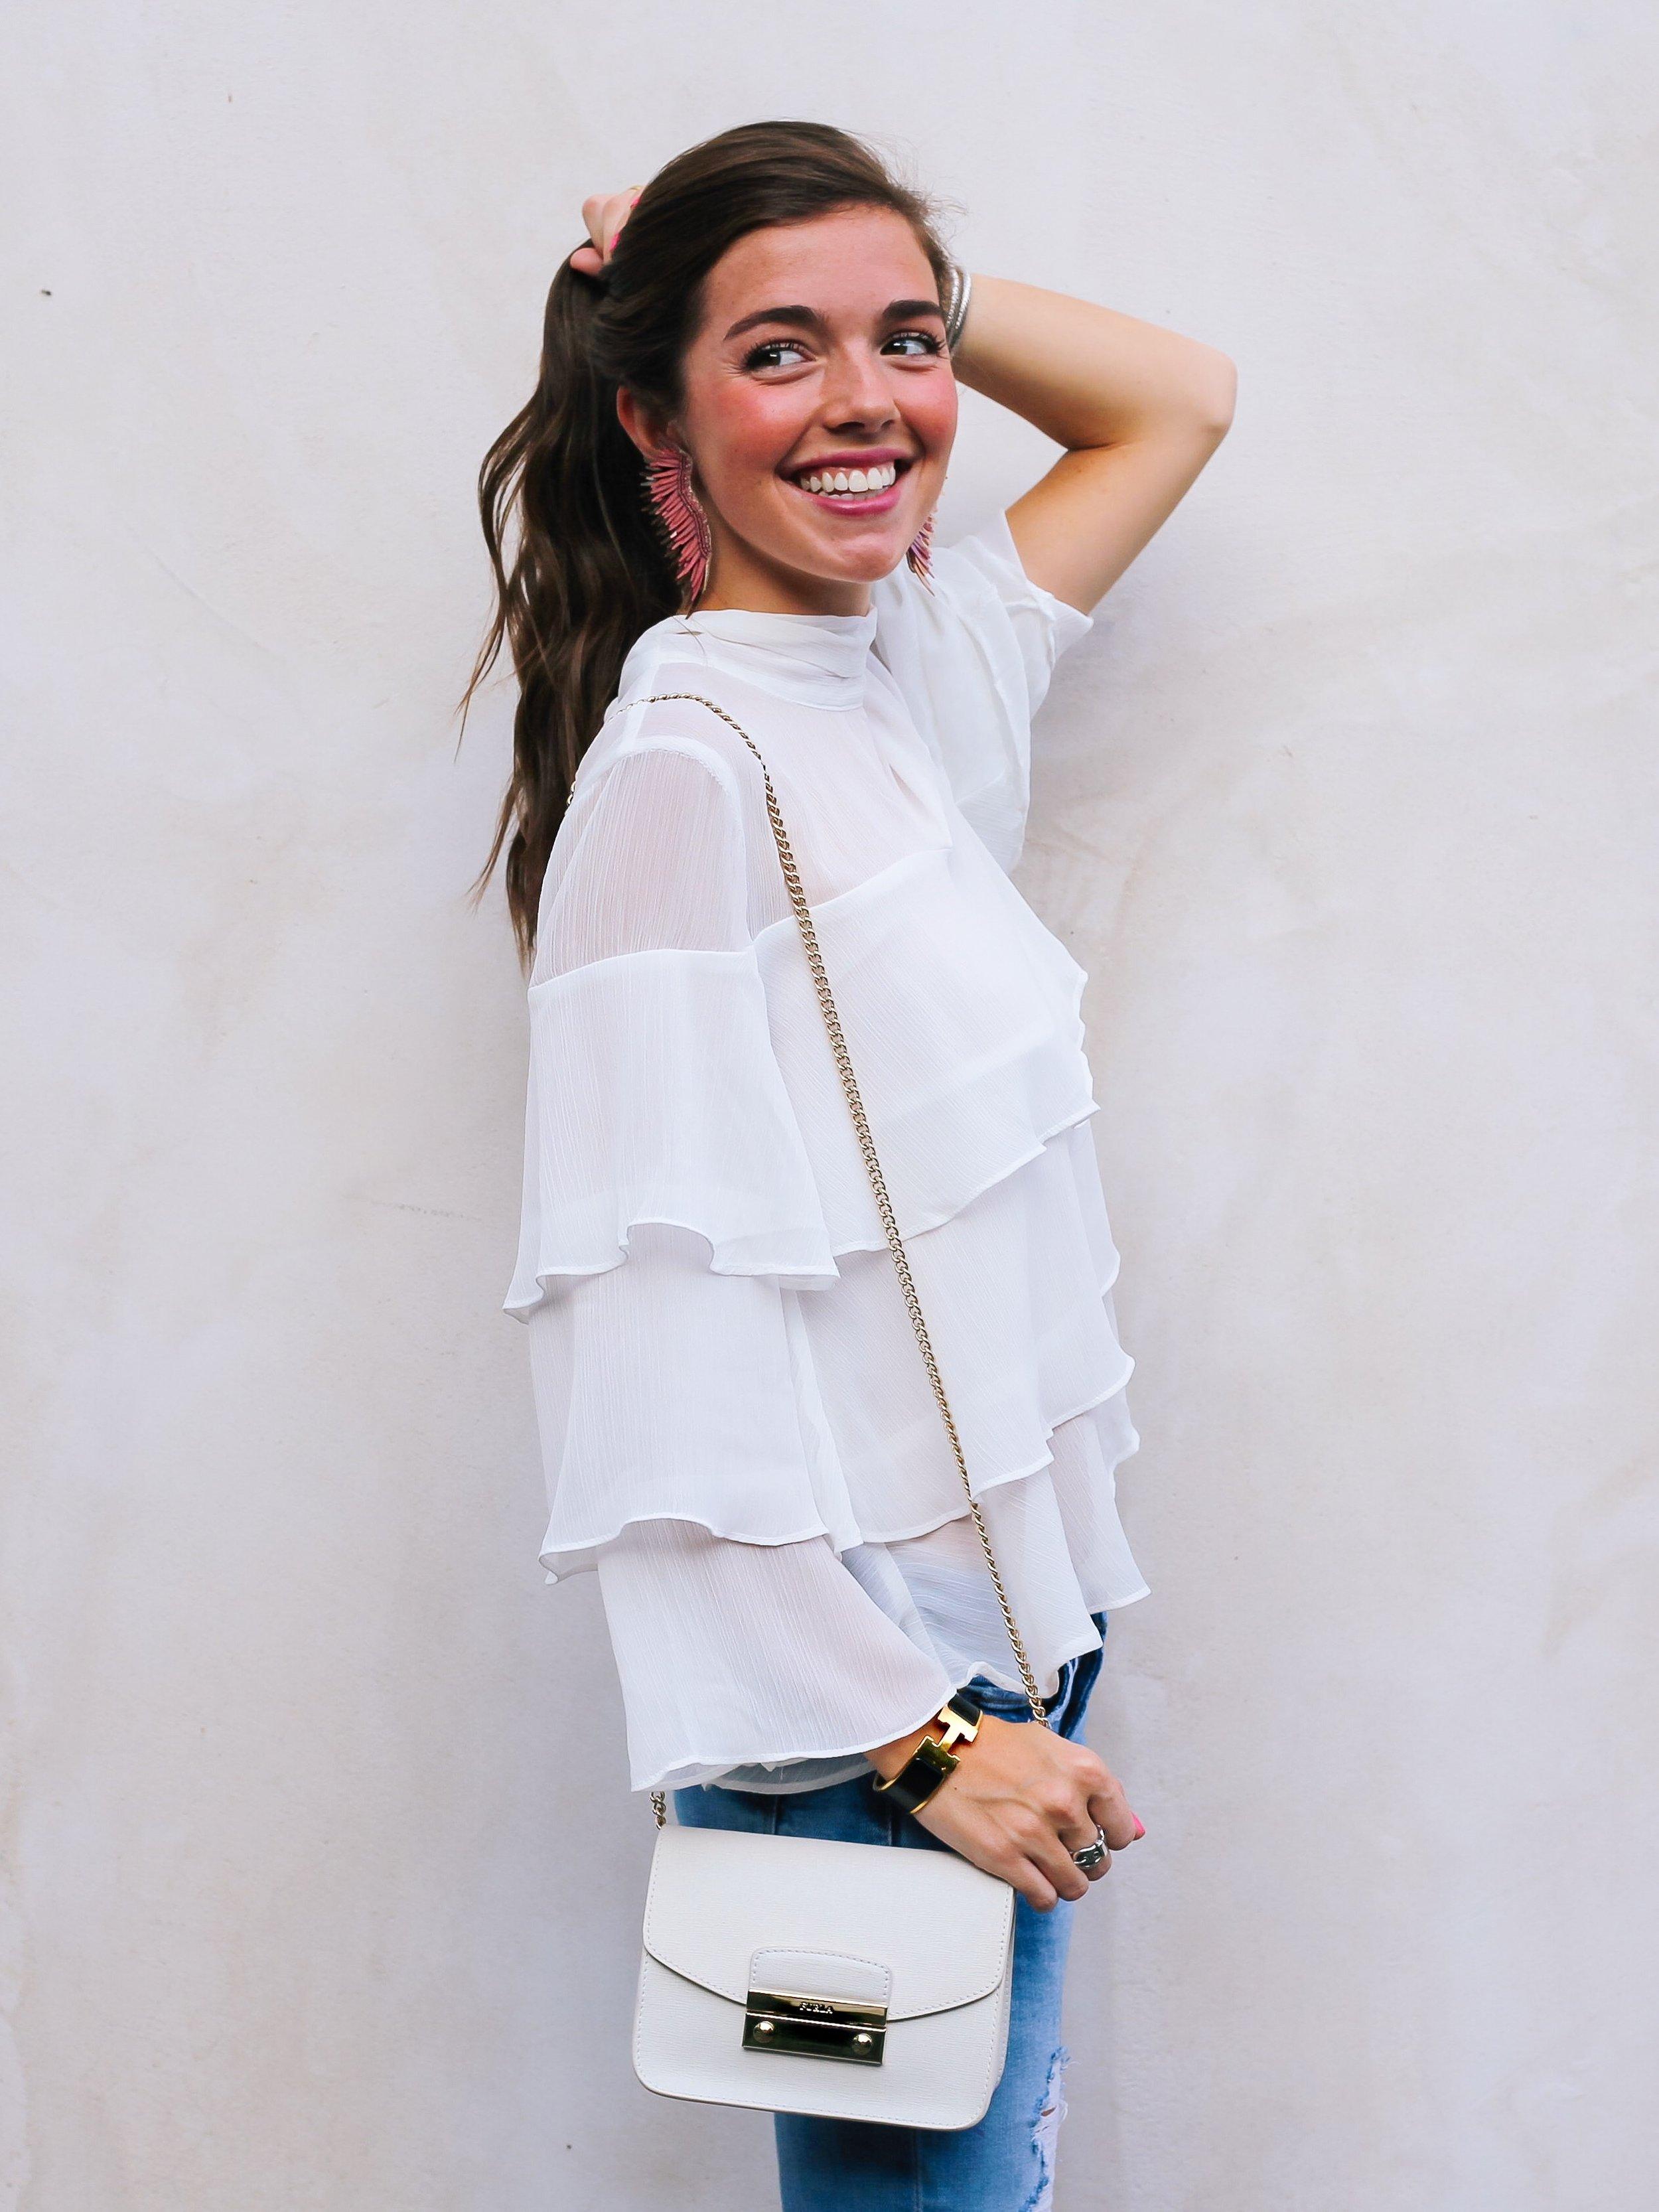 fashion blogger lcb style mignonne gavigan ruffle top schutz shoes (47 of 55)c.jpg